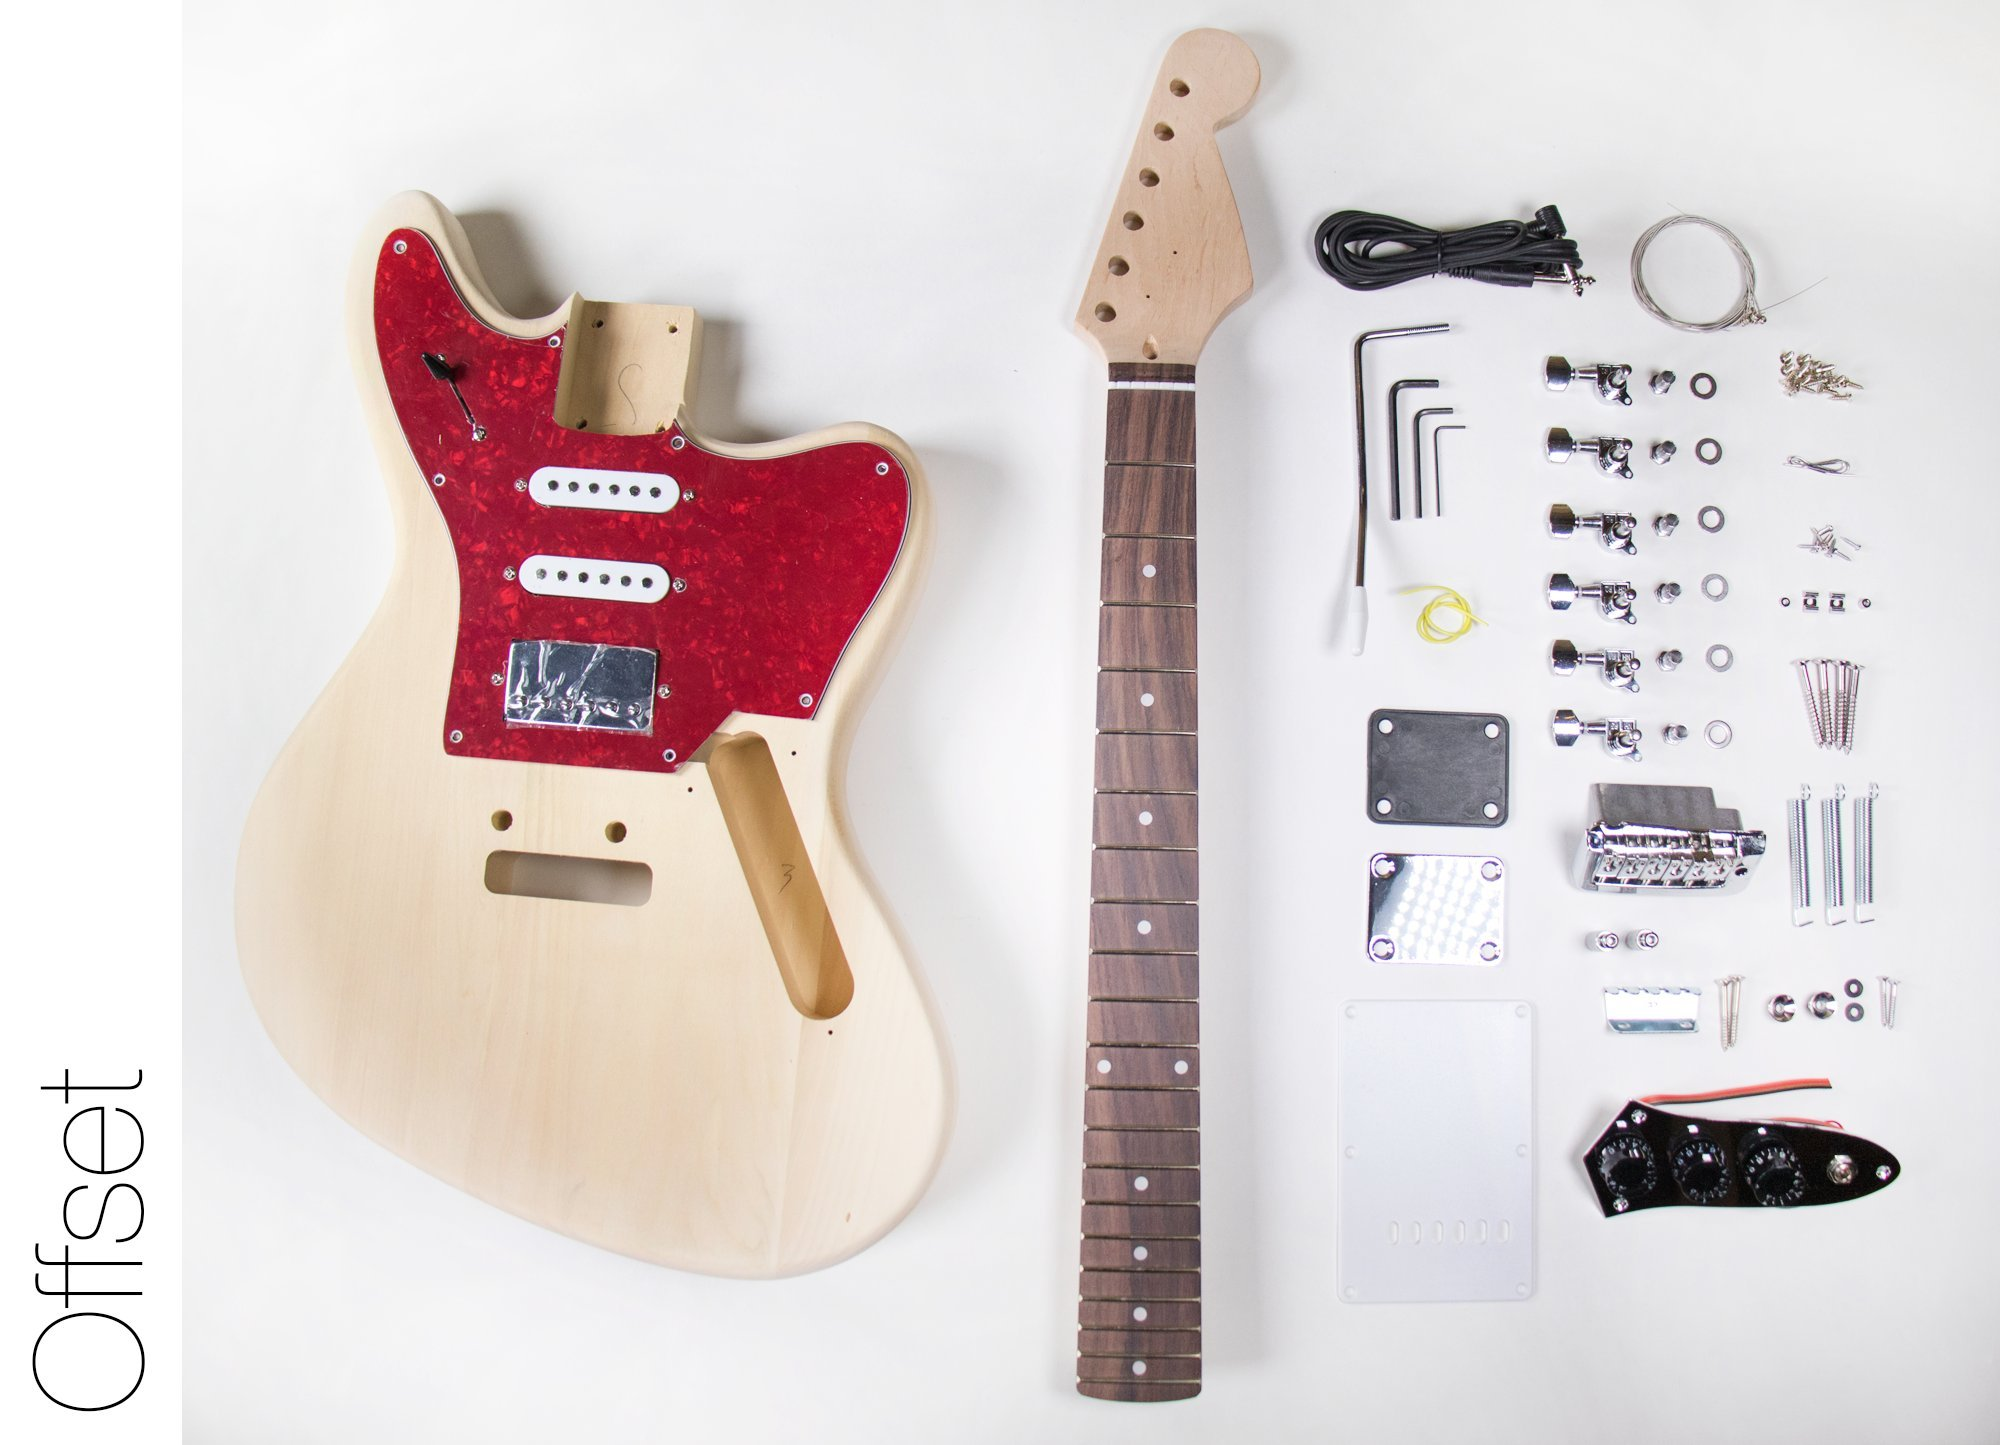 diy electric guitar kit jaguar style build your own guitar kit guitar yurt. Black Bedroom Furniture Sets. Home Design Ideas